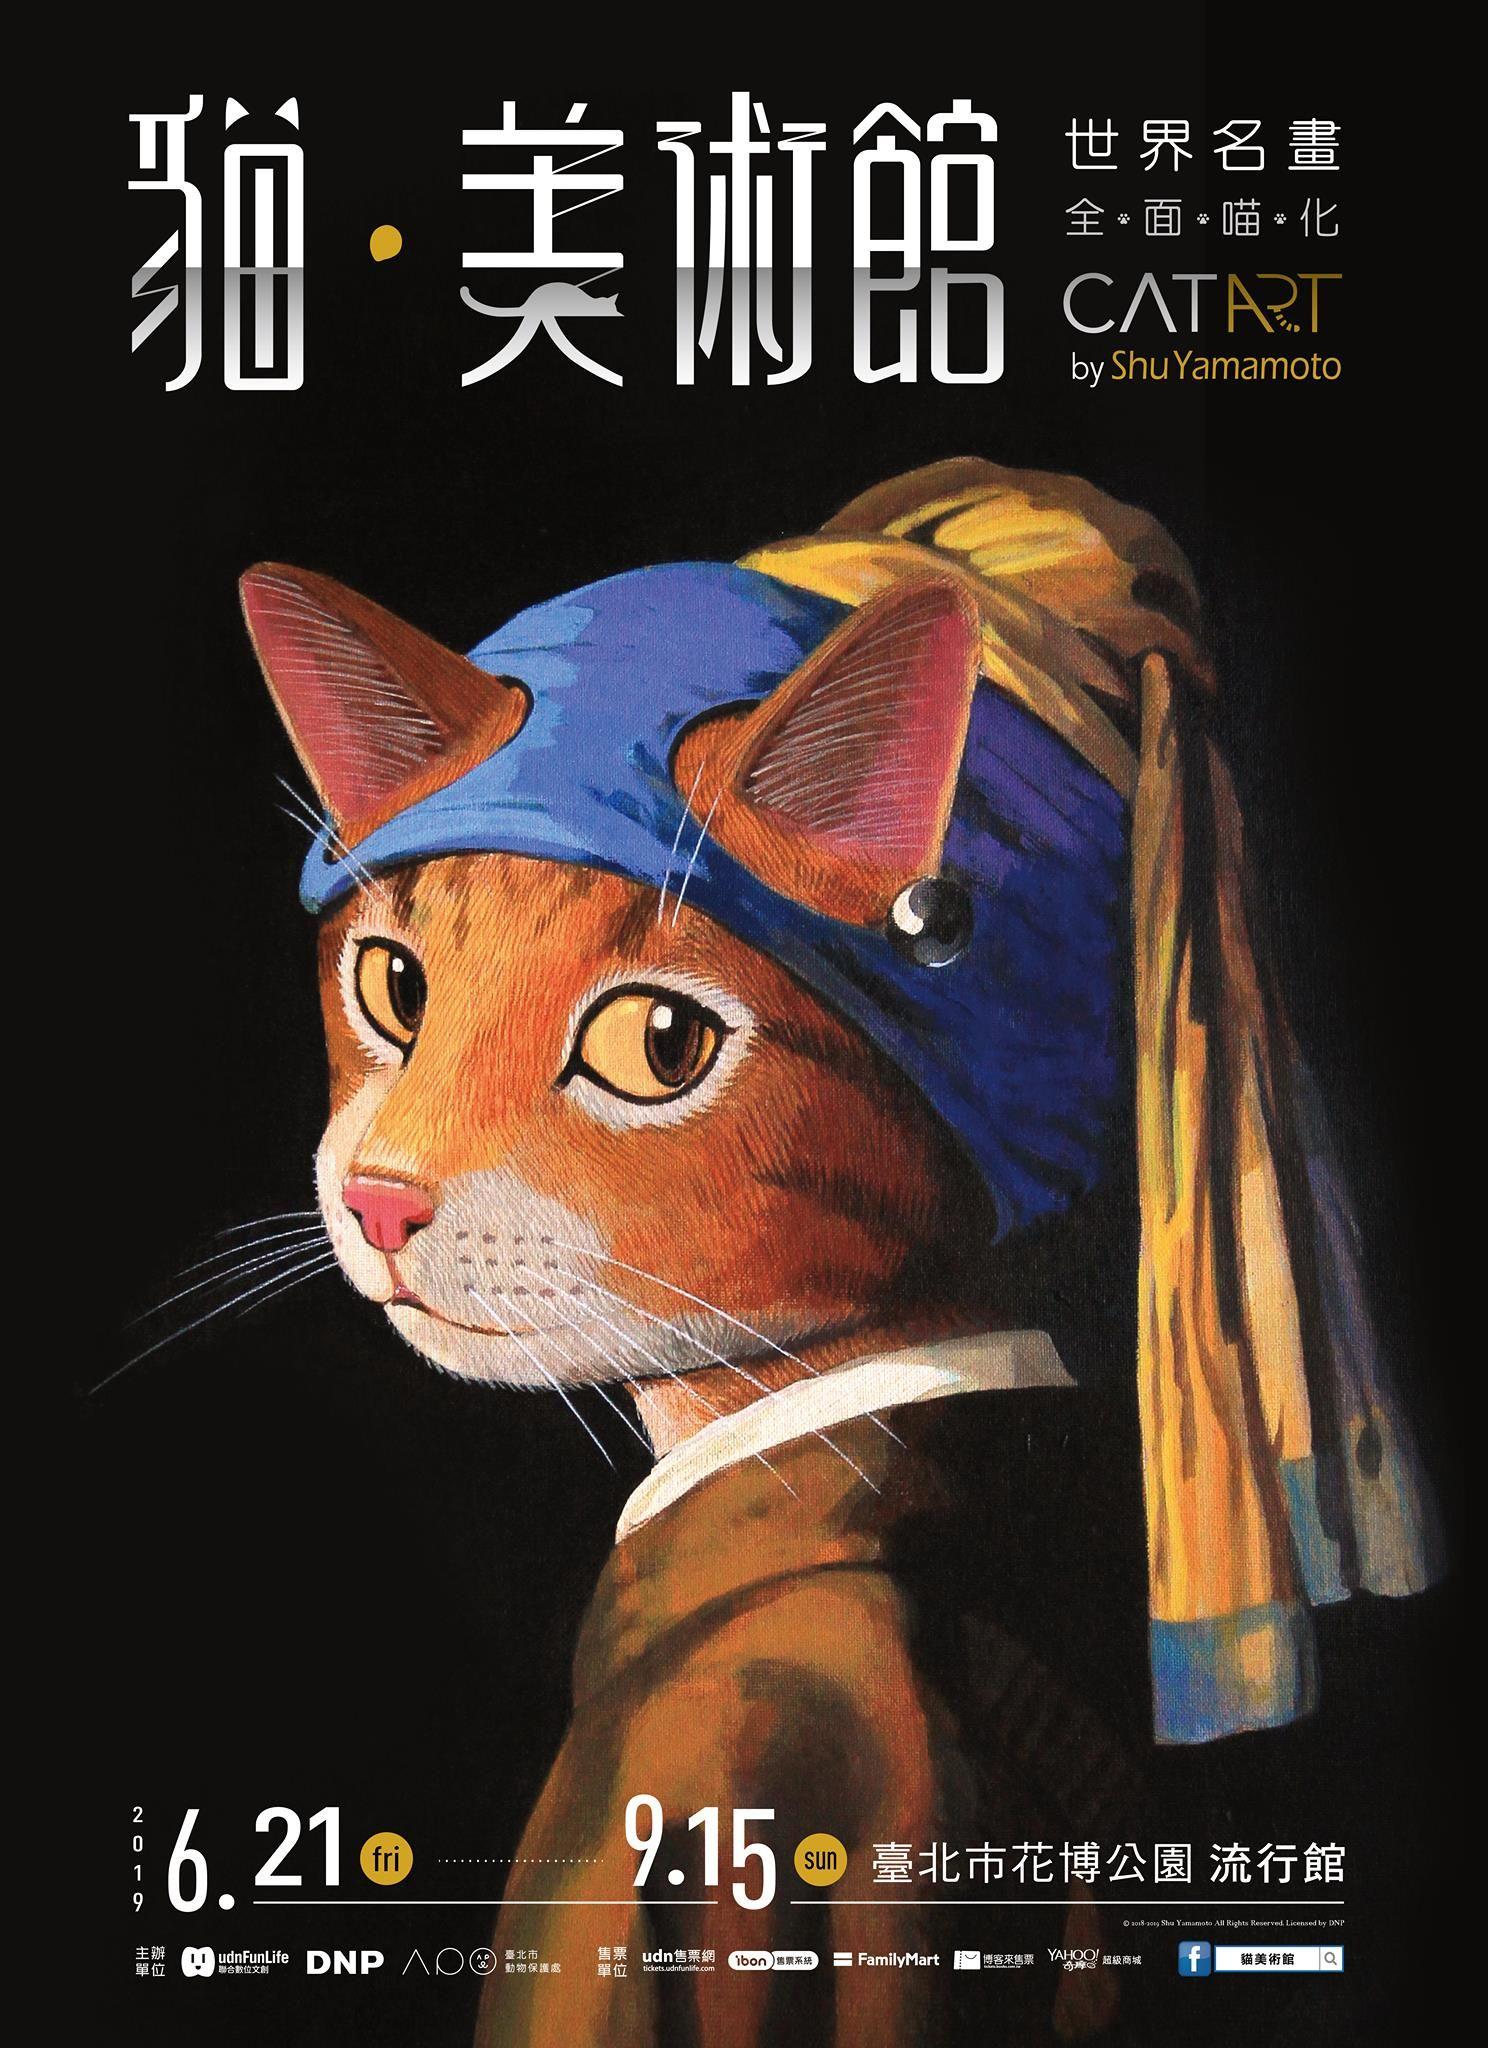 Pin by Jimmy Wu on Typo Cat art, Whimsical art, Art